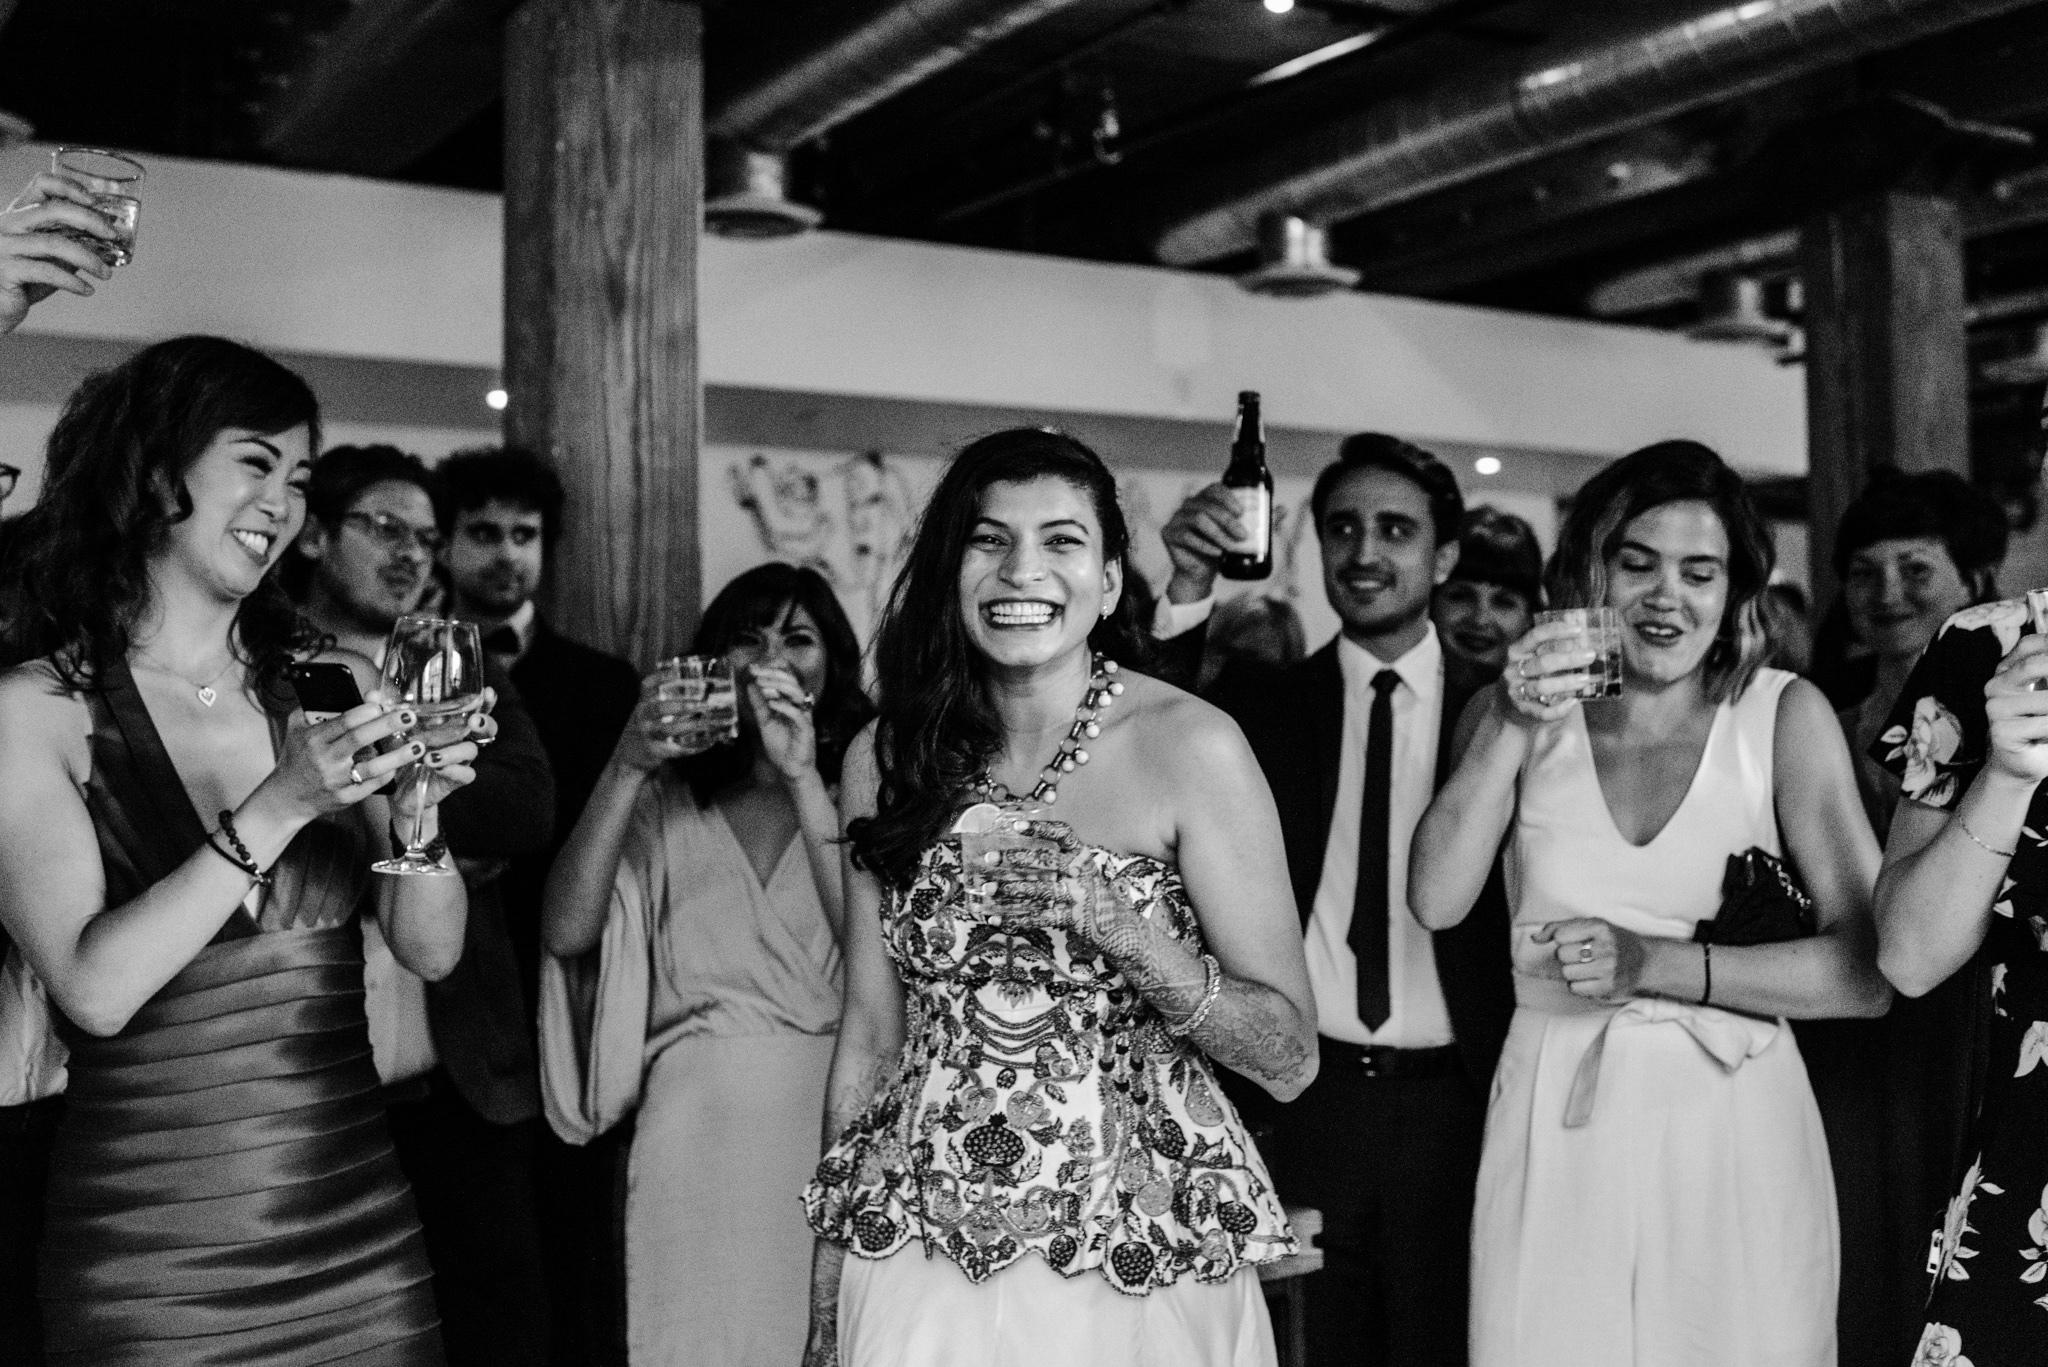 046-bride-groom-reception-documentary-photography-hotel-ocho.jpg